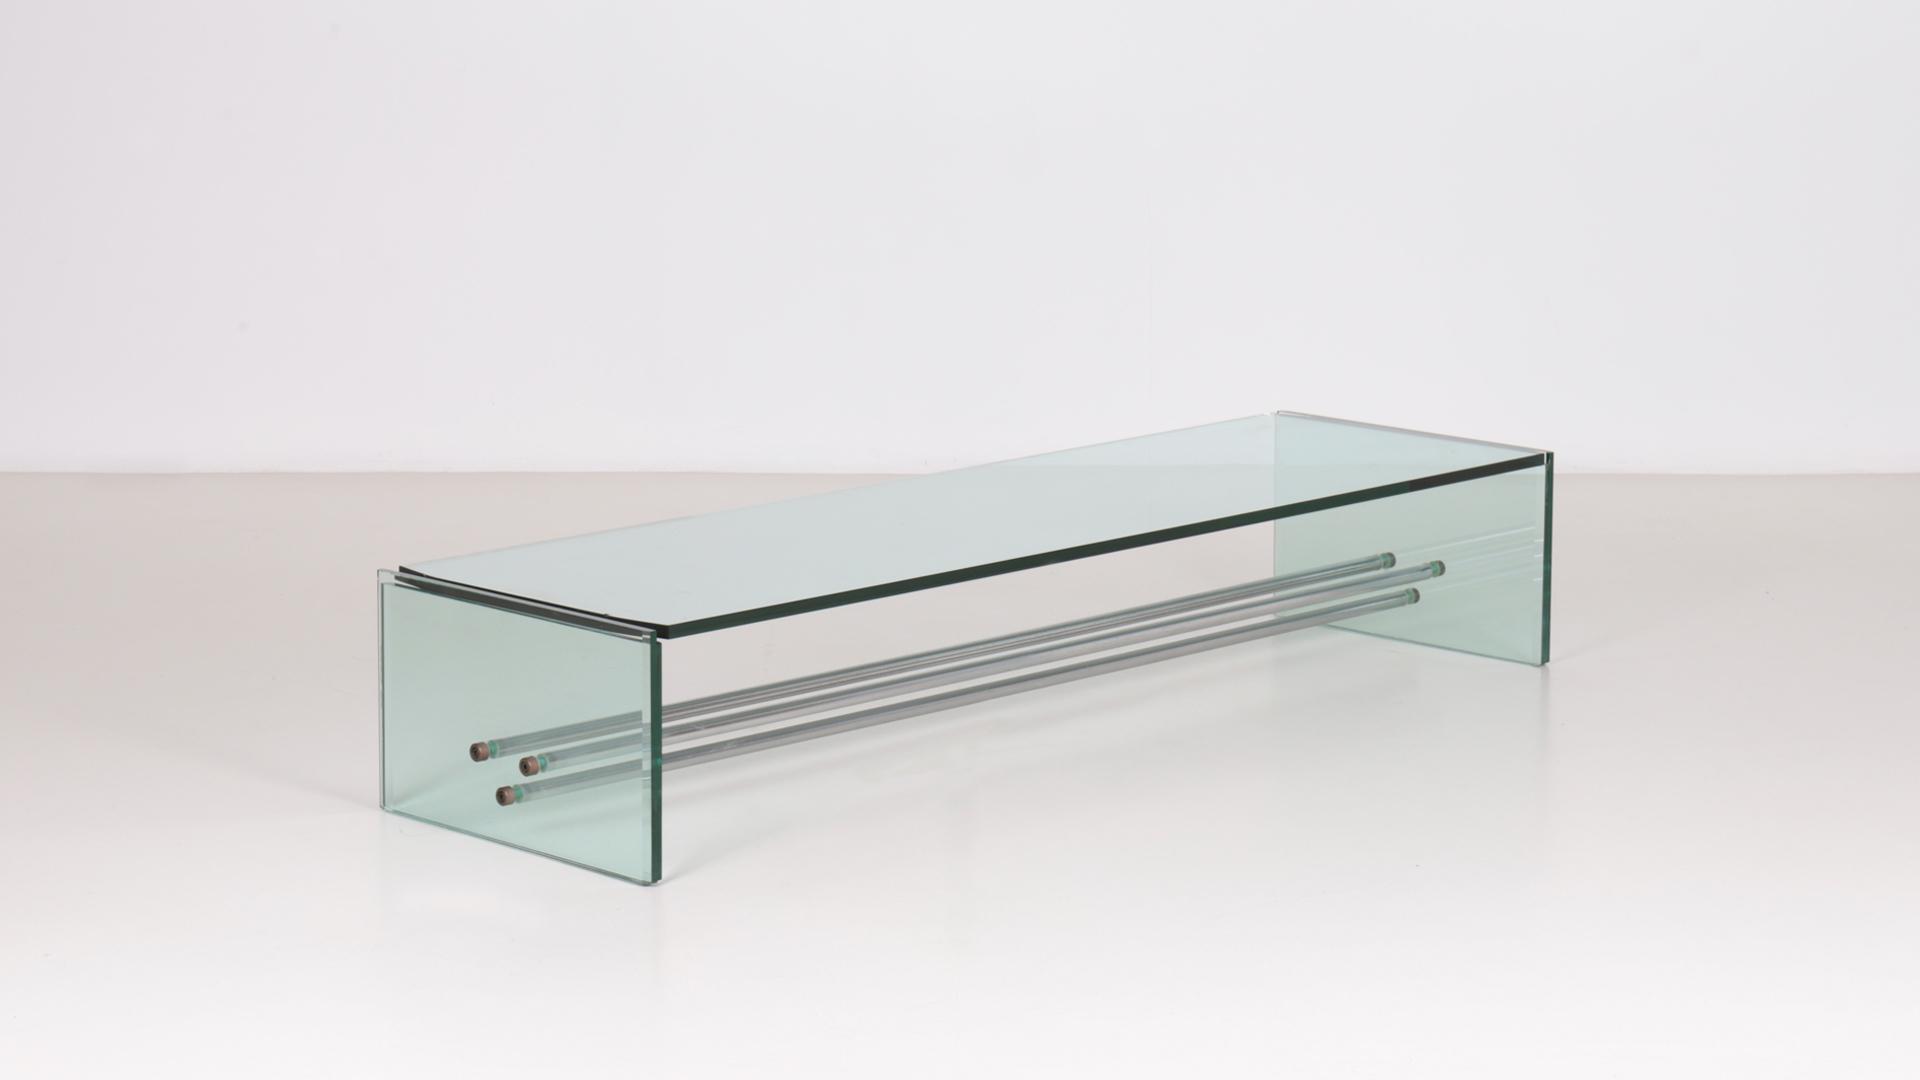 Burano low table by Hiroyuki Toyoda | Paradisoterrestre